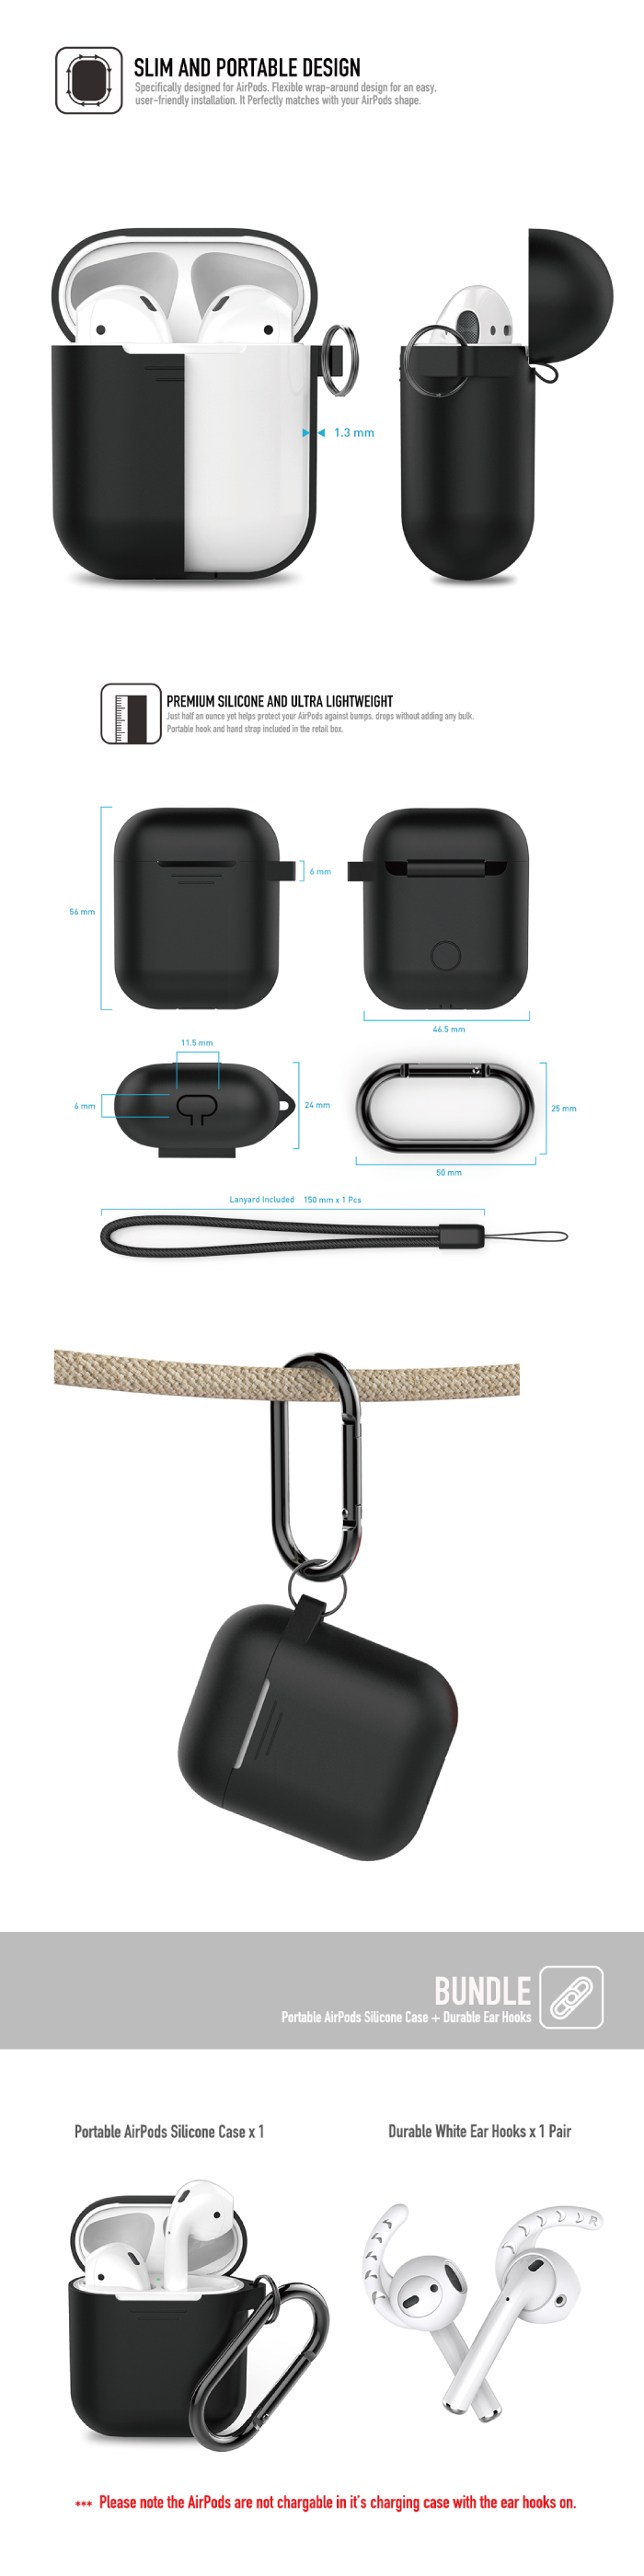 工具豆 | AHAstyle PODFIT 2.0 - AIRPODS 專用全包覆掛勾保護套(黑色)